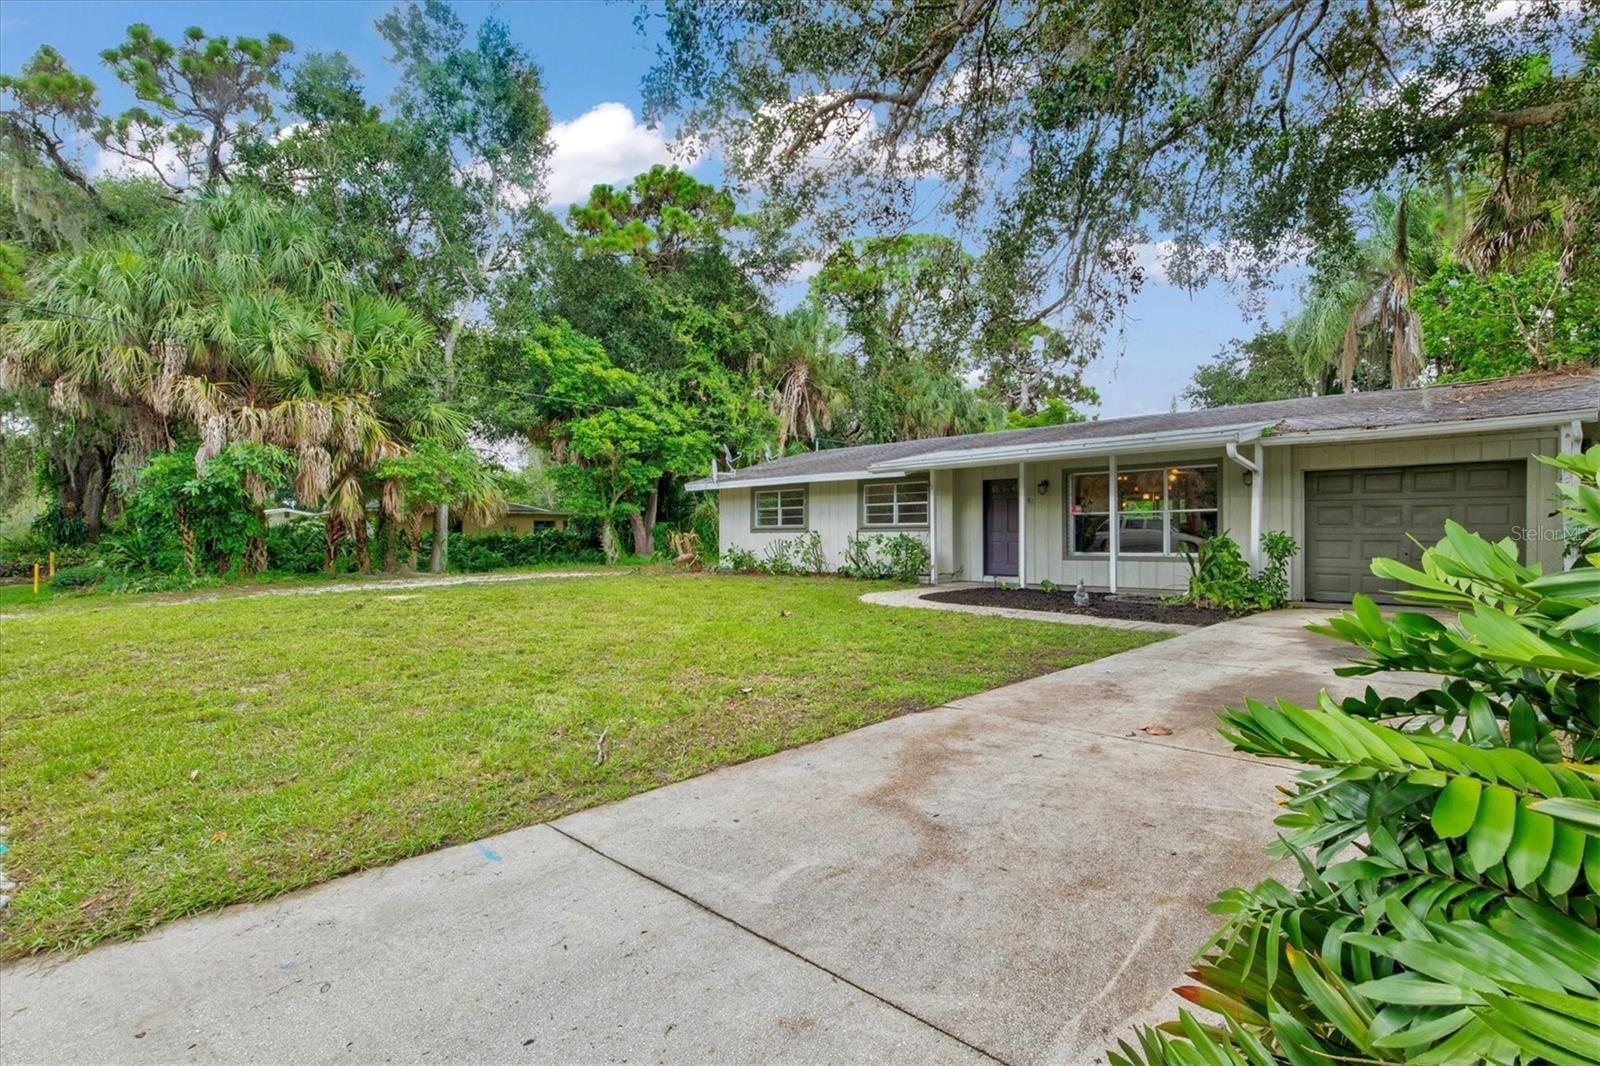 2182 WISTERIA STREET, Sarasota, FL 34239 - #: A4511994